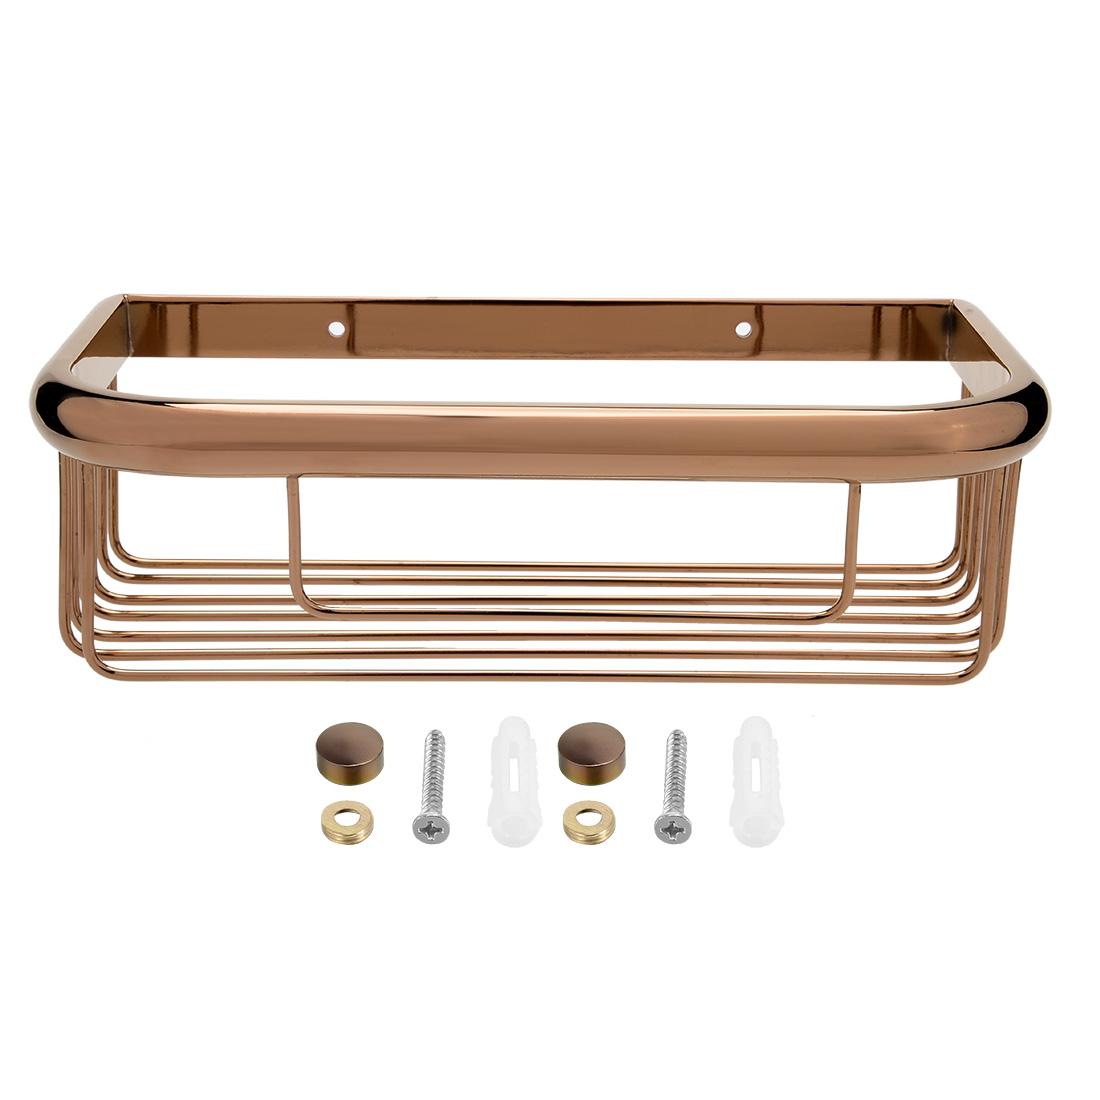 10-inch Brass Wall Mount Rectangle Shape Bathroom Shower Basket Caddy Rose Gold